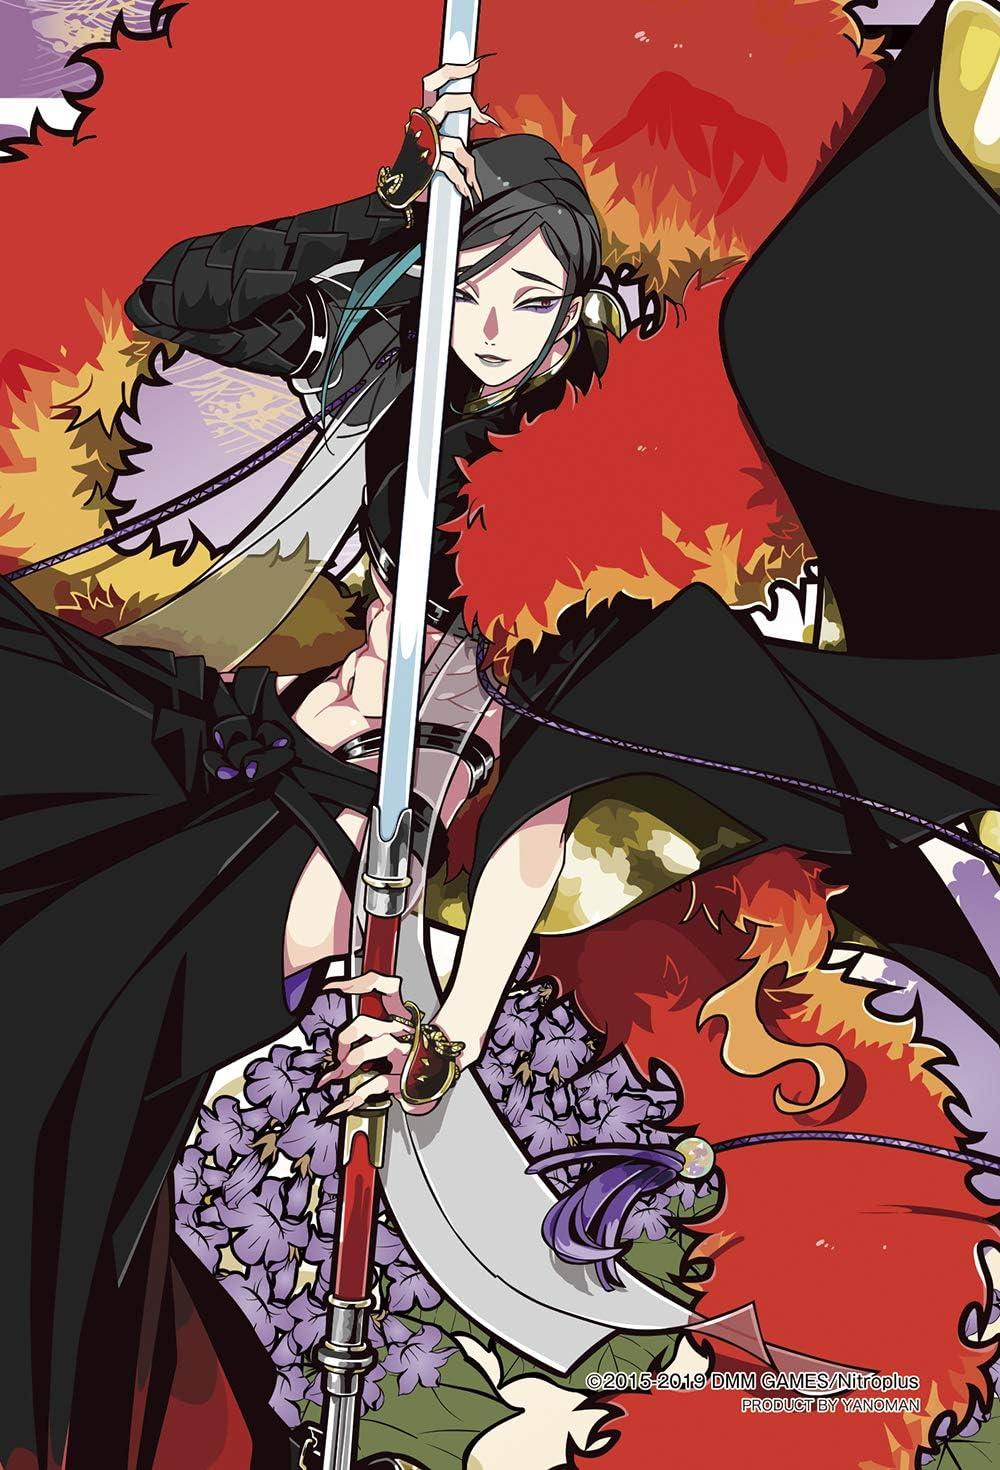 Amazon 70ピース ジグソーパズル 刀剣乱舞 Online 静形薙刀 桐